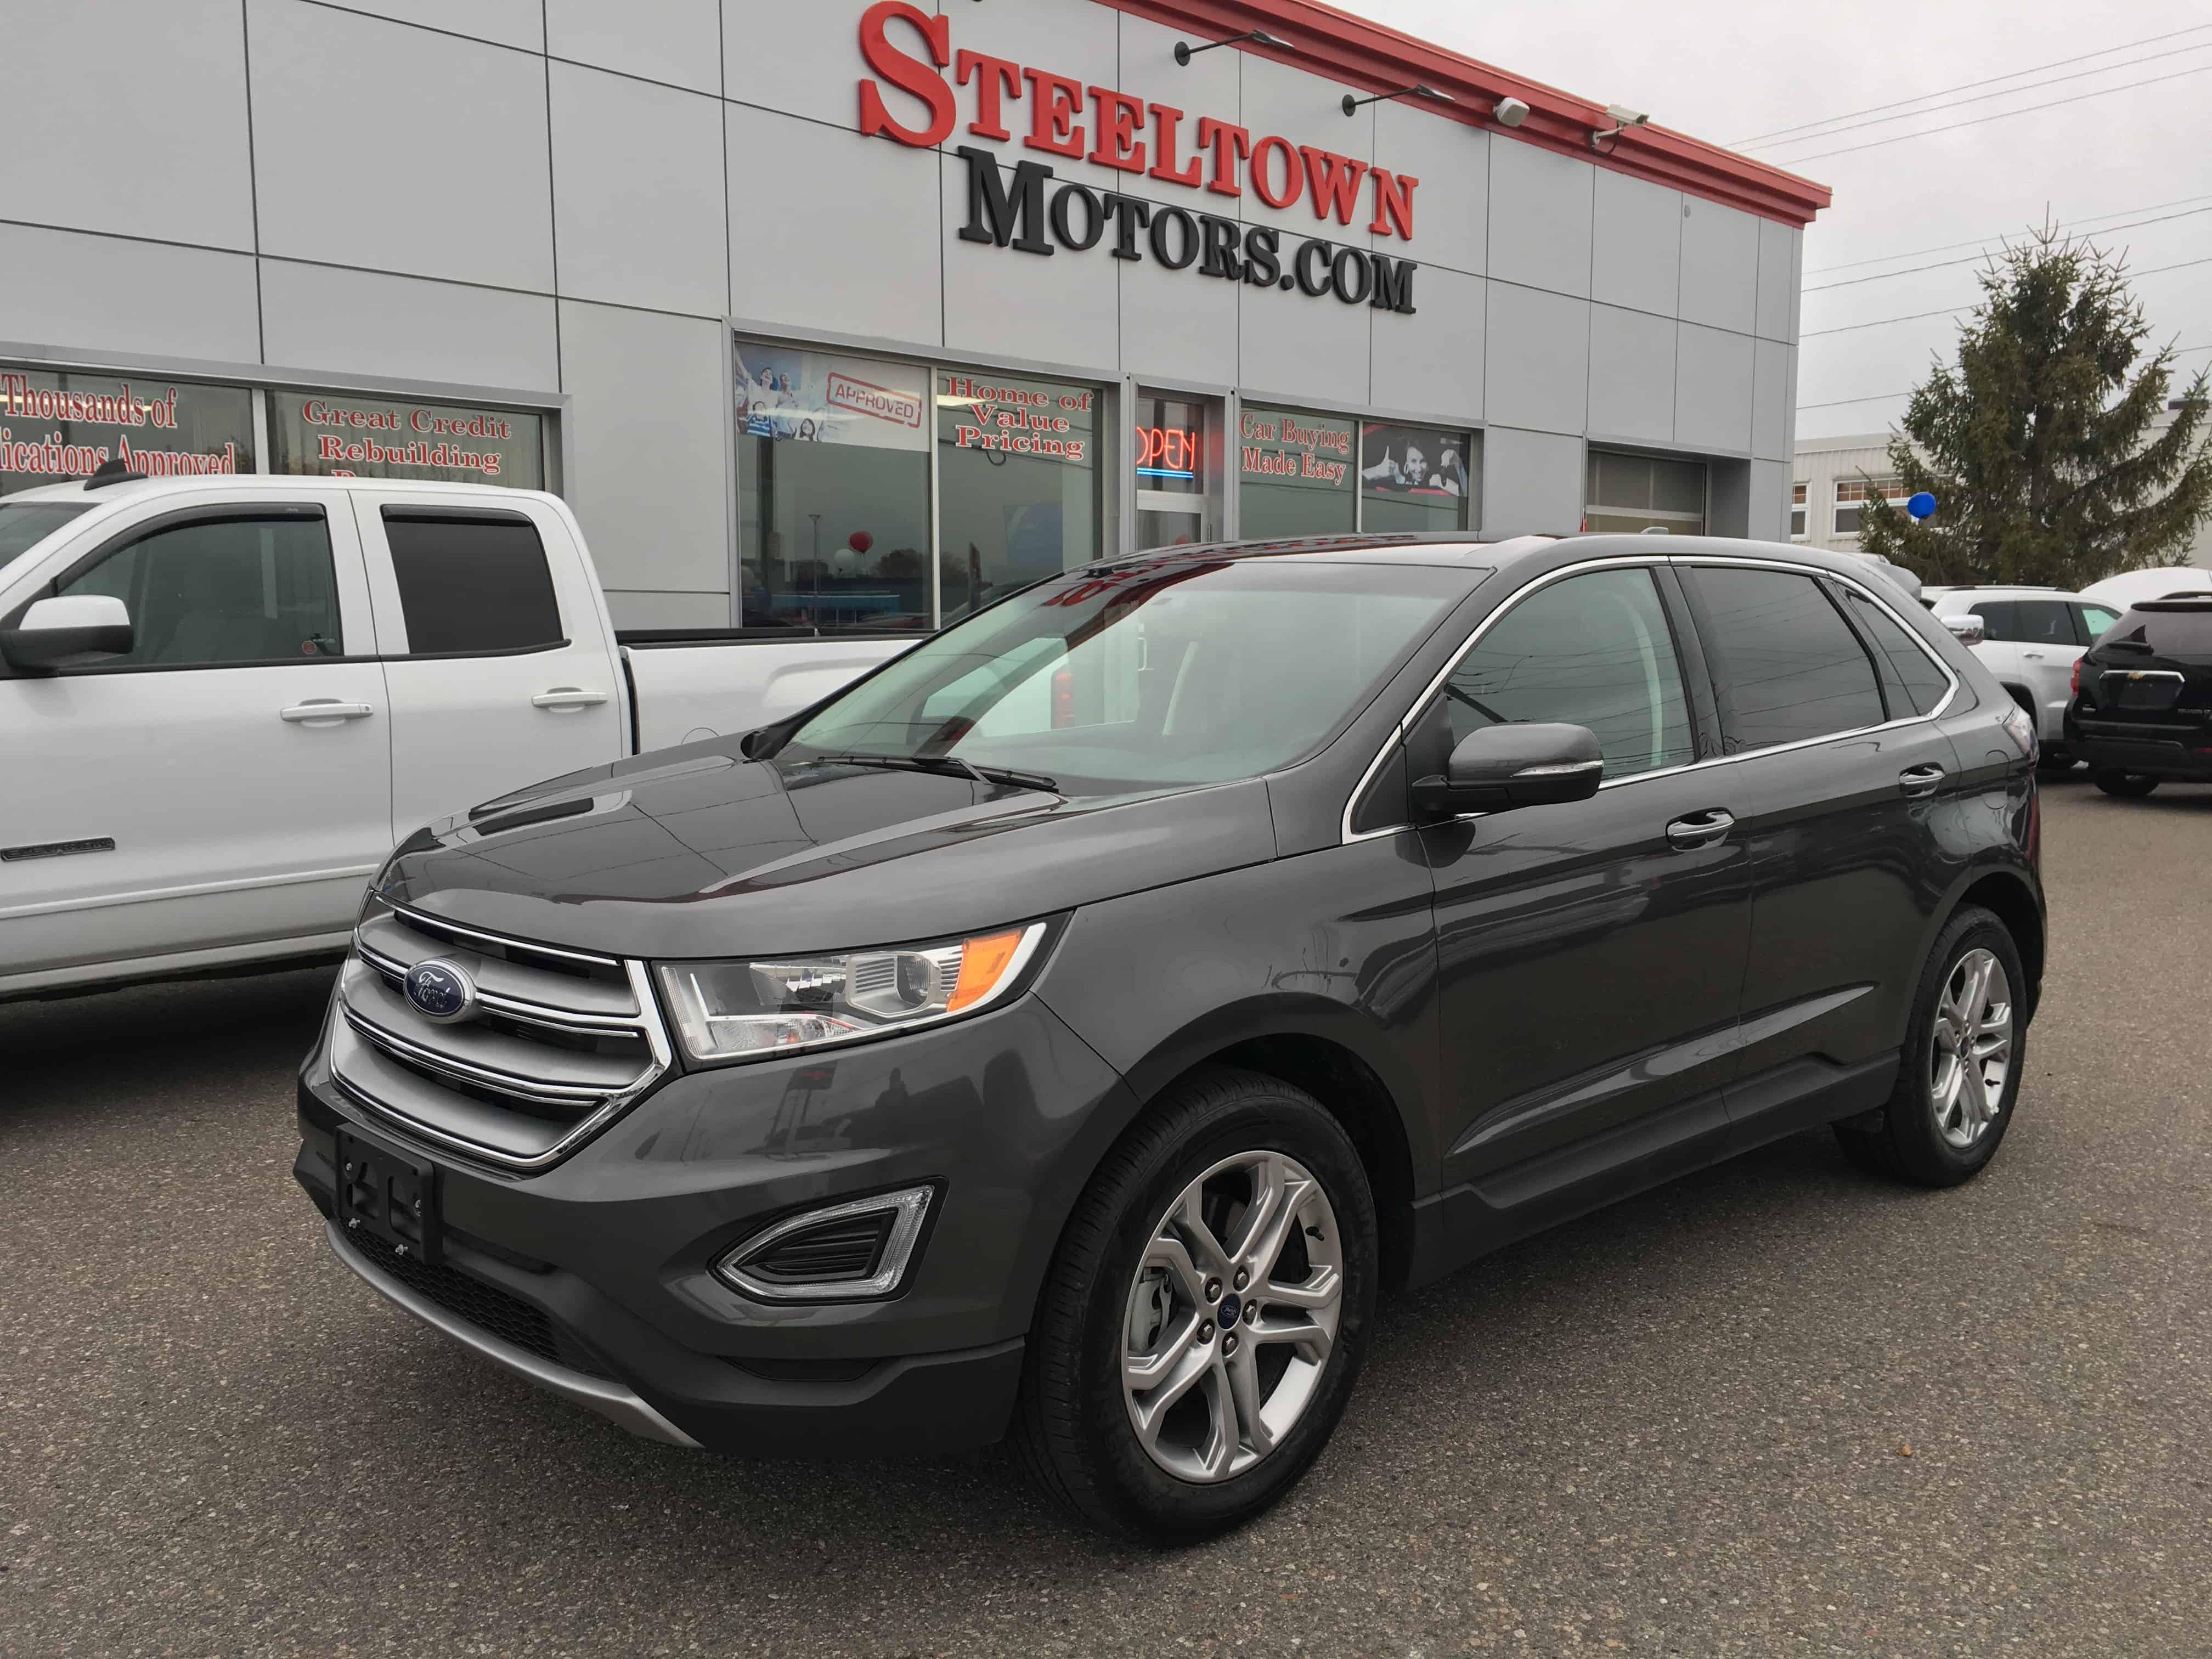 Ford Edge Titanium Awd Sold Steeltown Motors